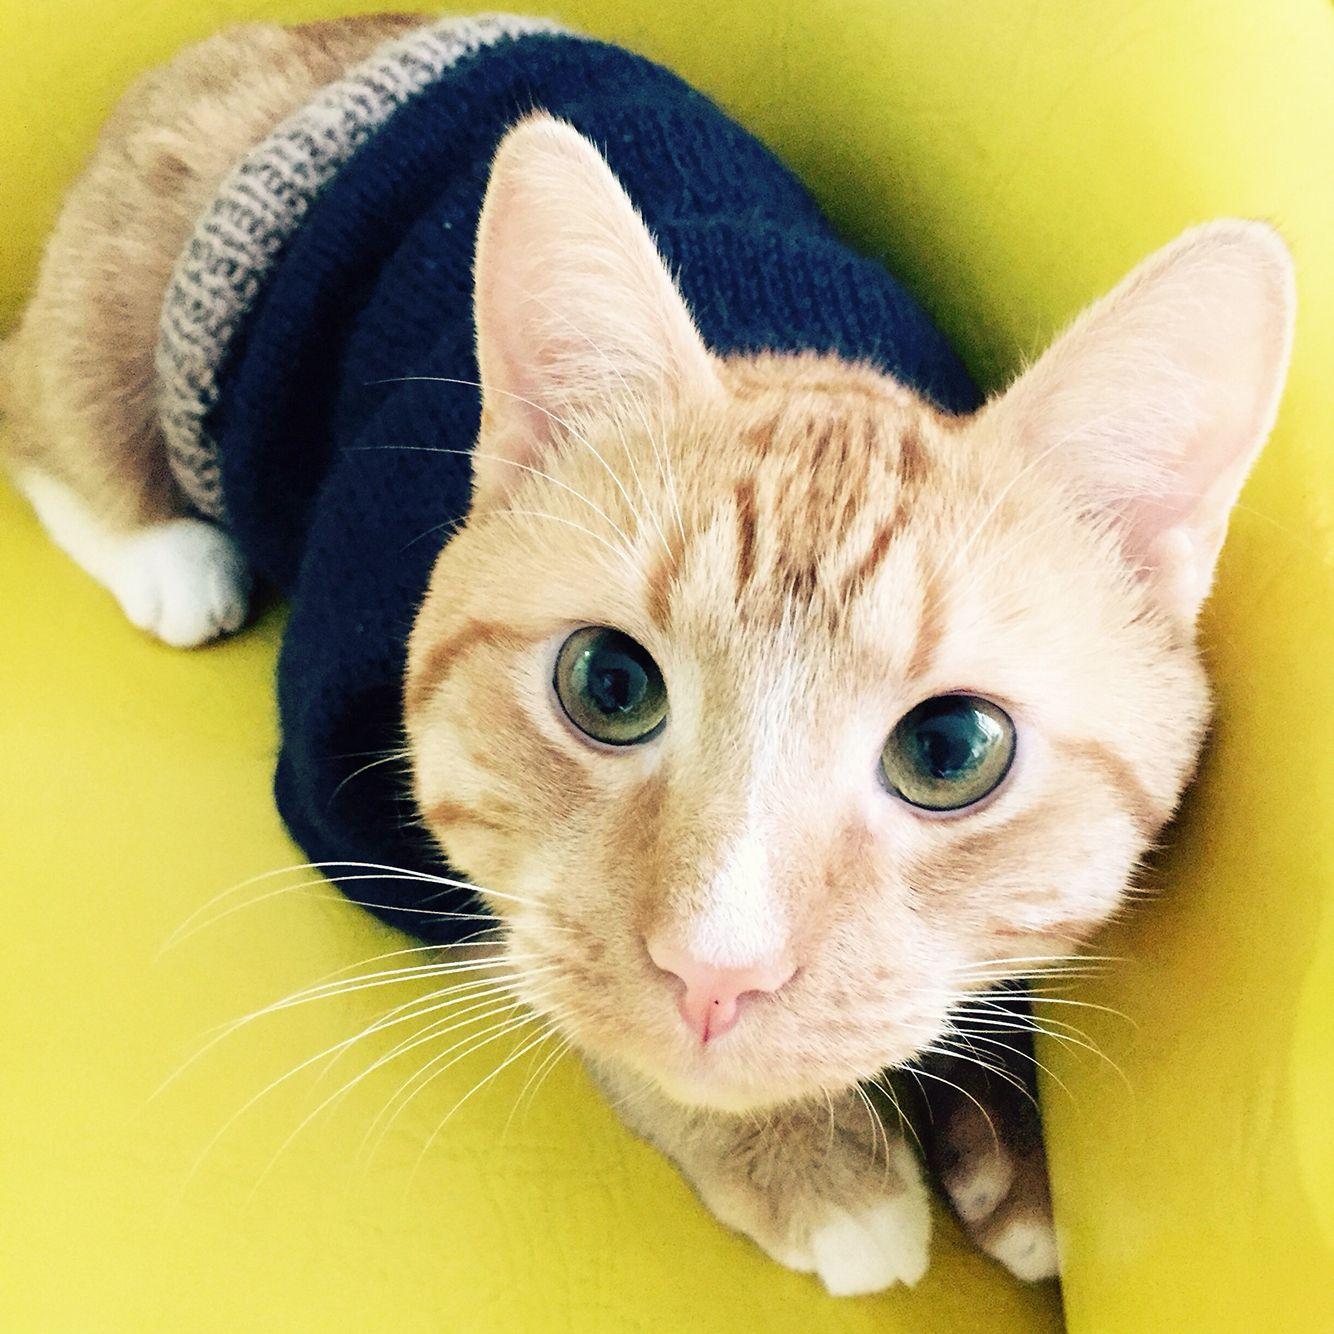 Kitten Wear Cat Jumper Kitty Sweater Kitten Cats Kitty